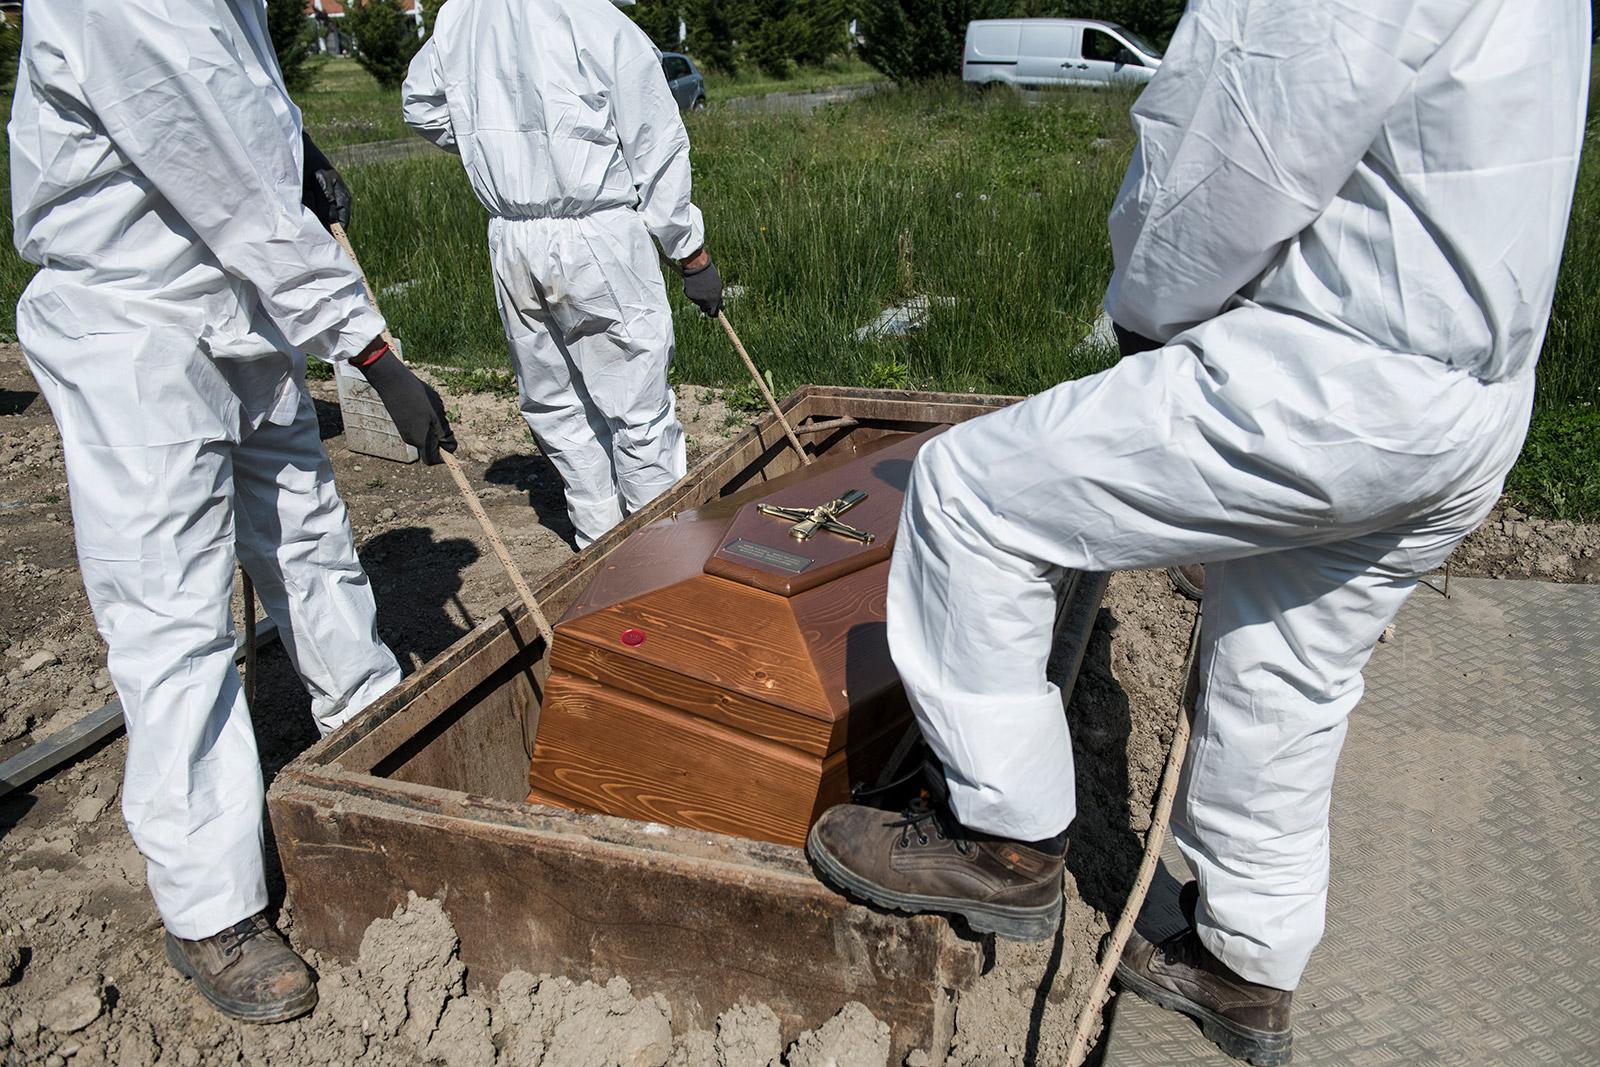 Cemetery workers bury a coronavirus victim in Turin, Italy, on May 6.